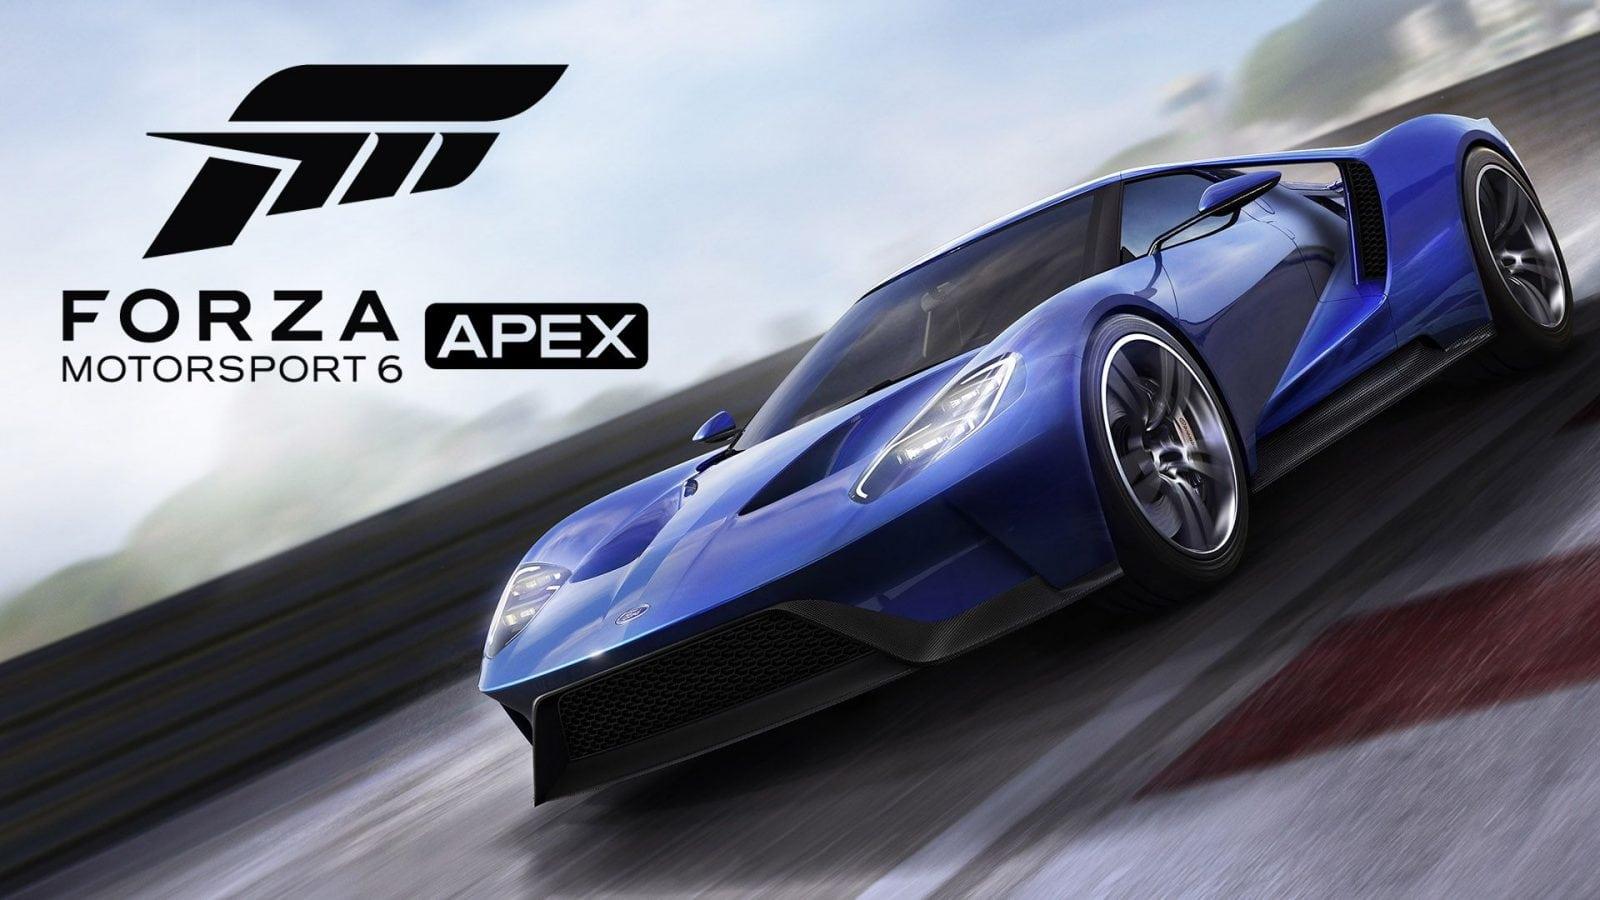 Forza 6 Apex não terá crossplay com Xbox One